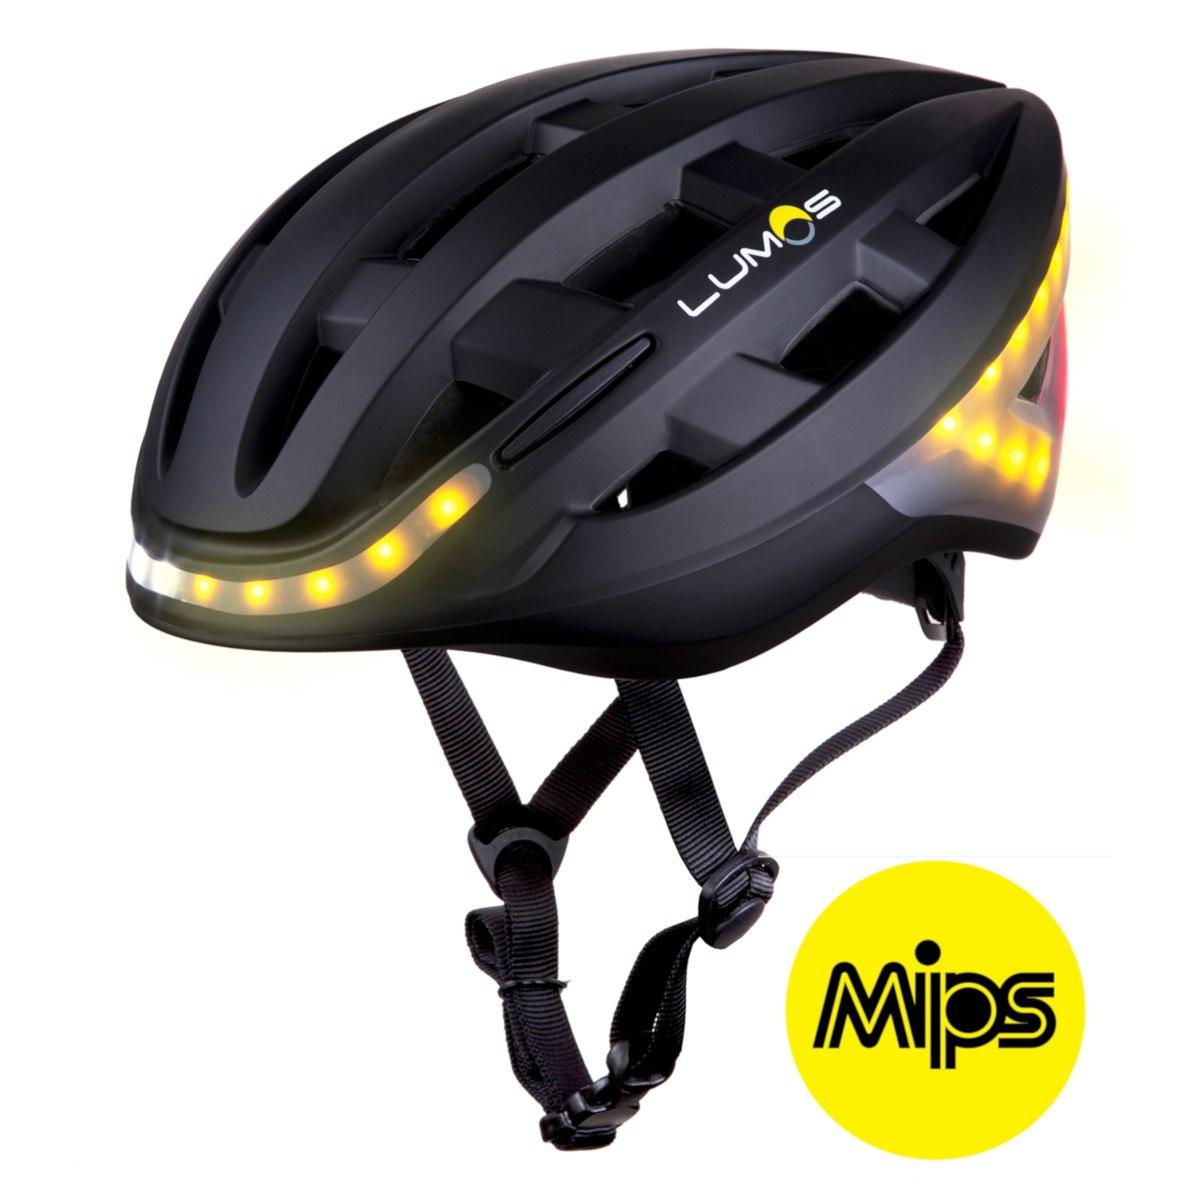 Lumos Kickstart MIPS Helmet - Charcoal Black